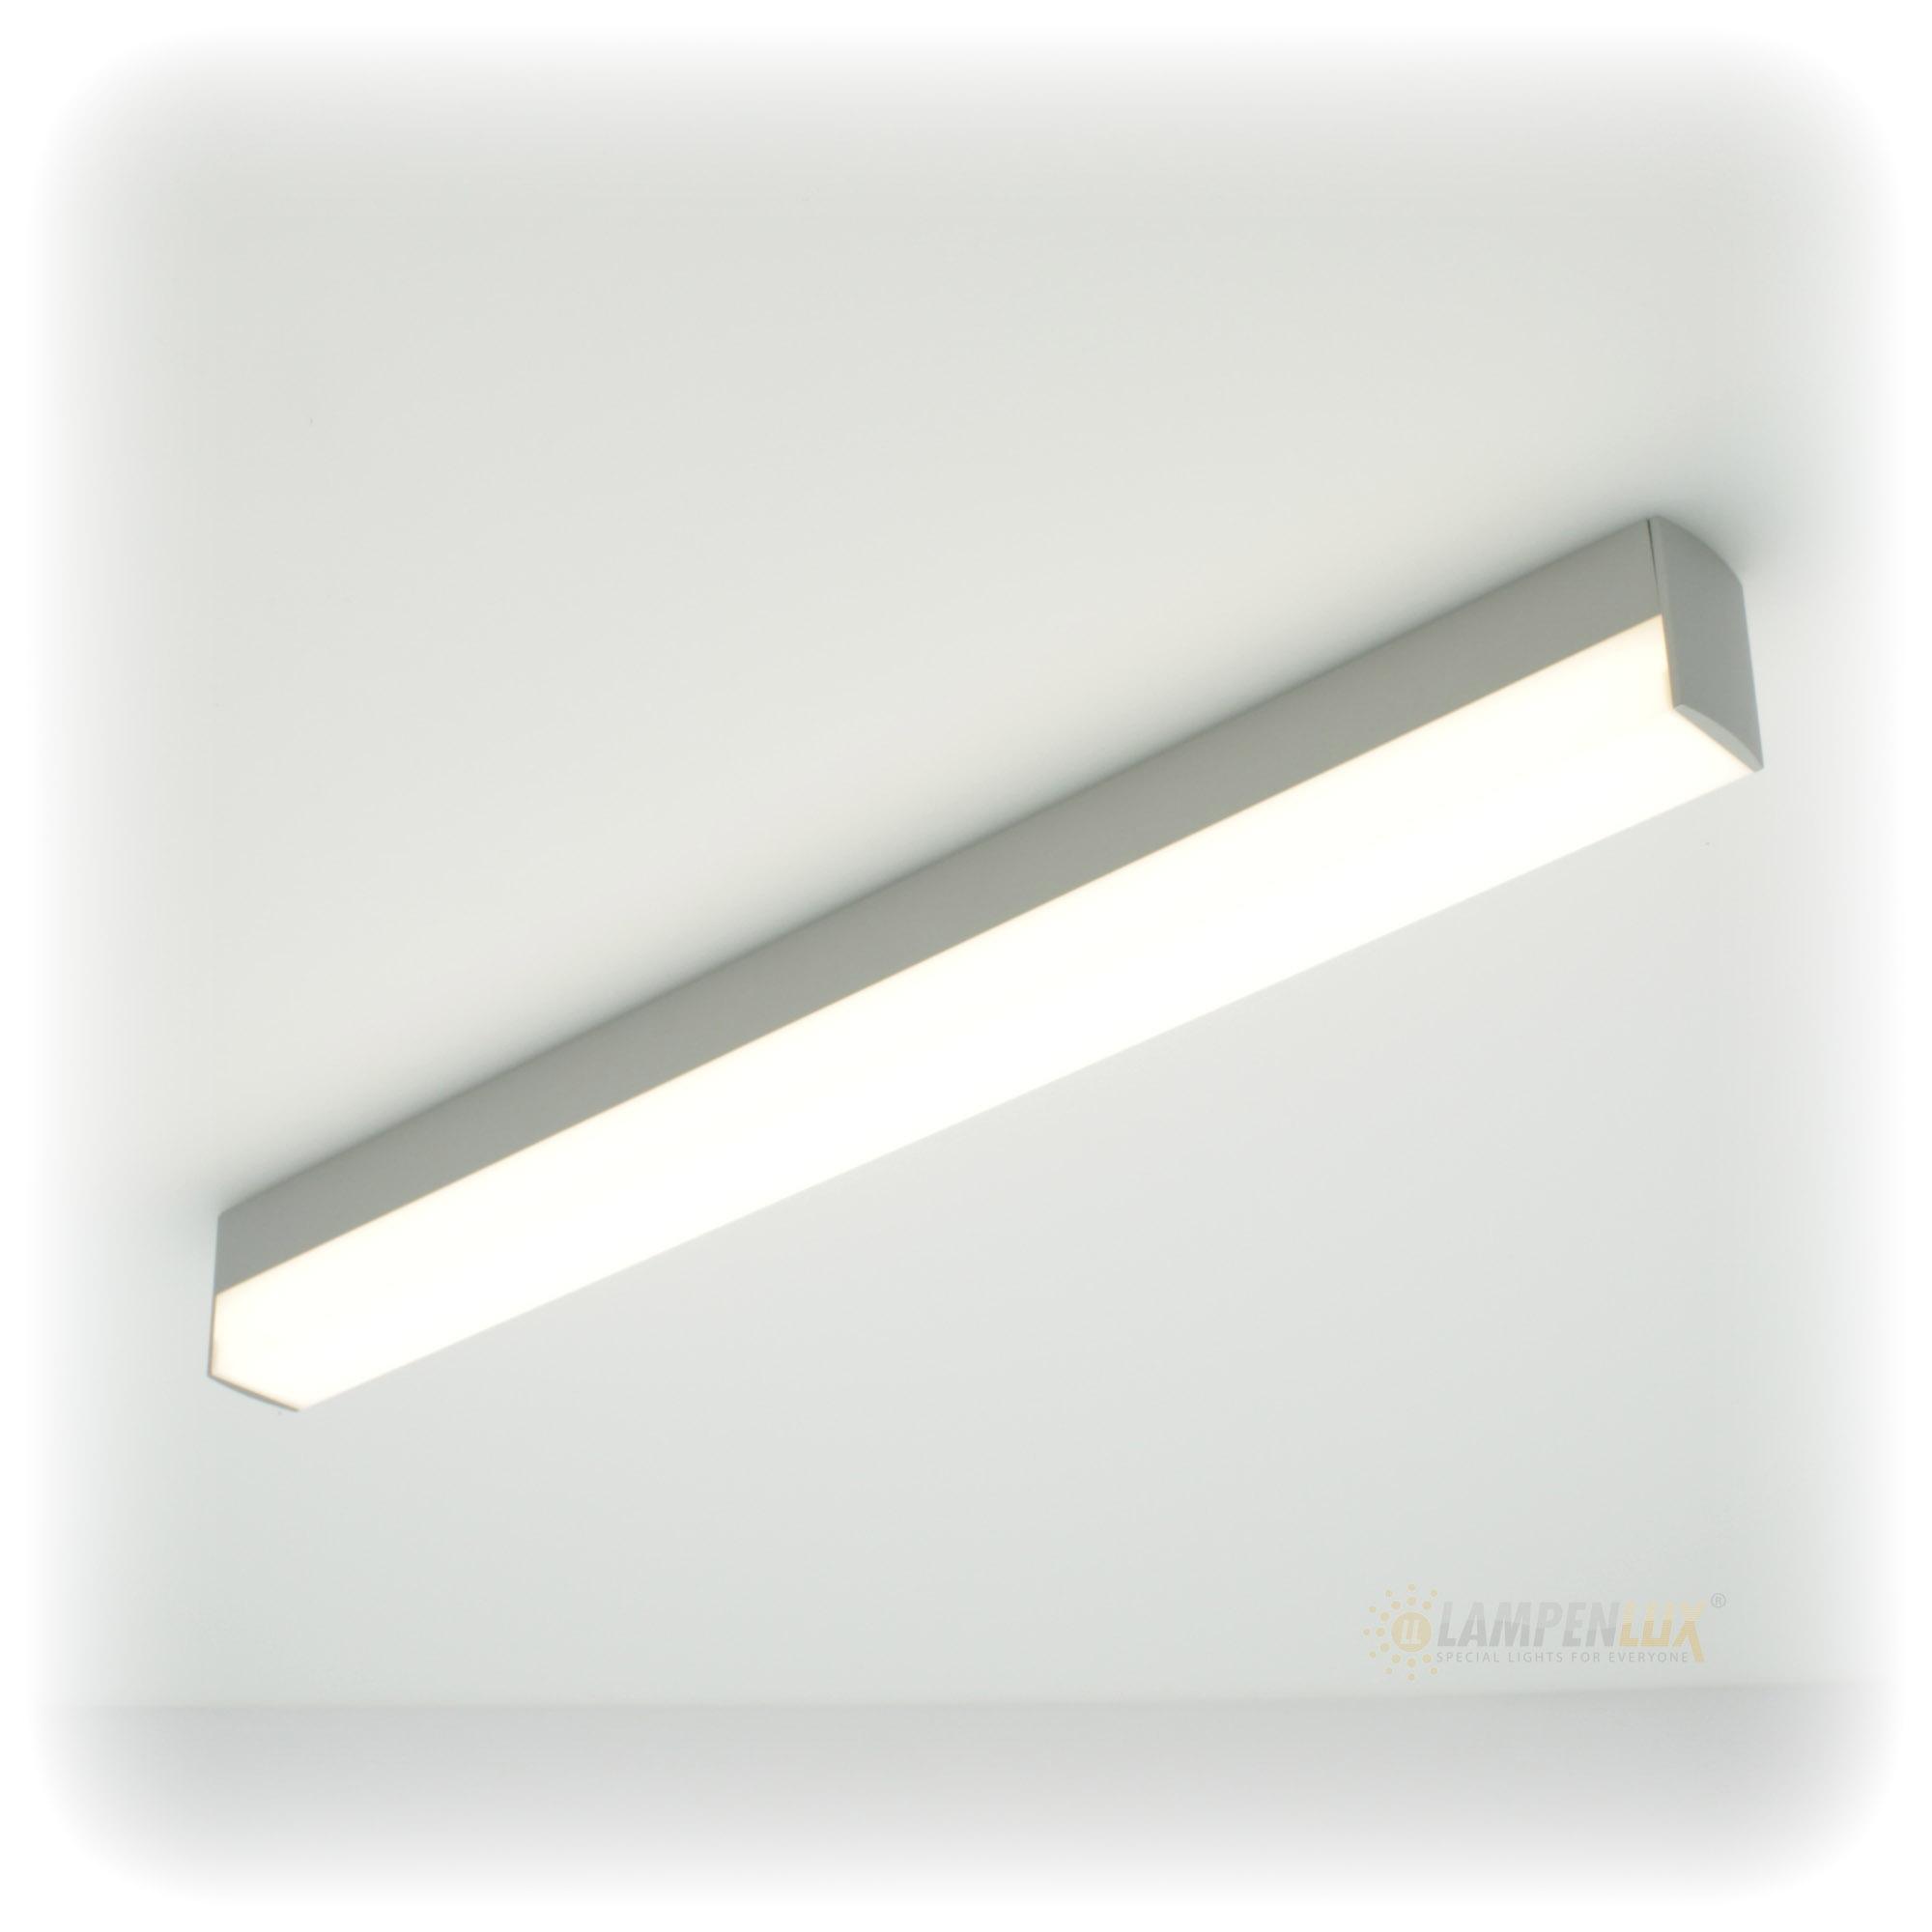 Lampenlux LED Wandlampe Wandleuchte Aaron Badlicht grau 24W 120cm inkl. LM